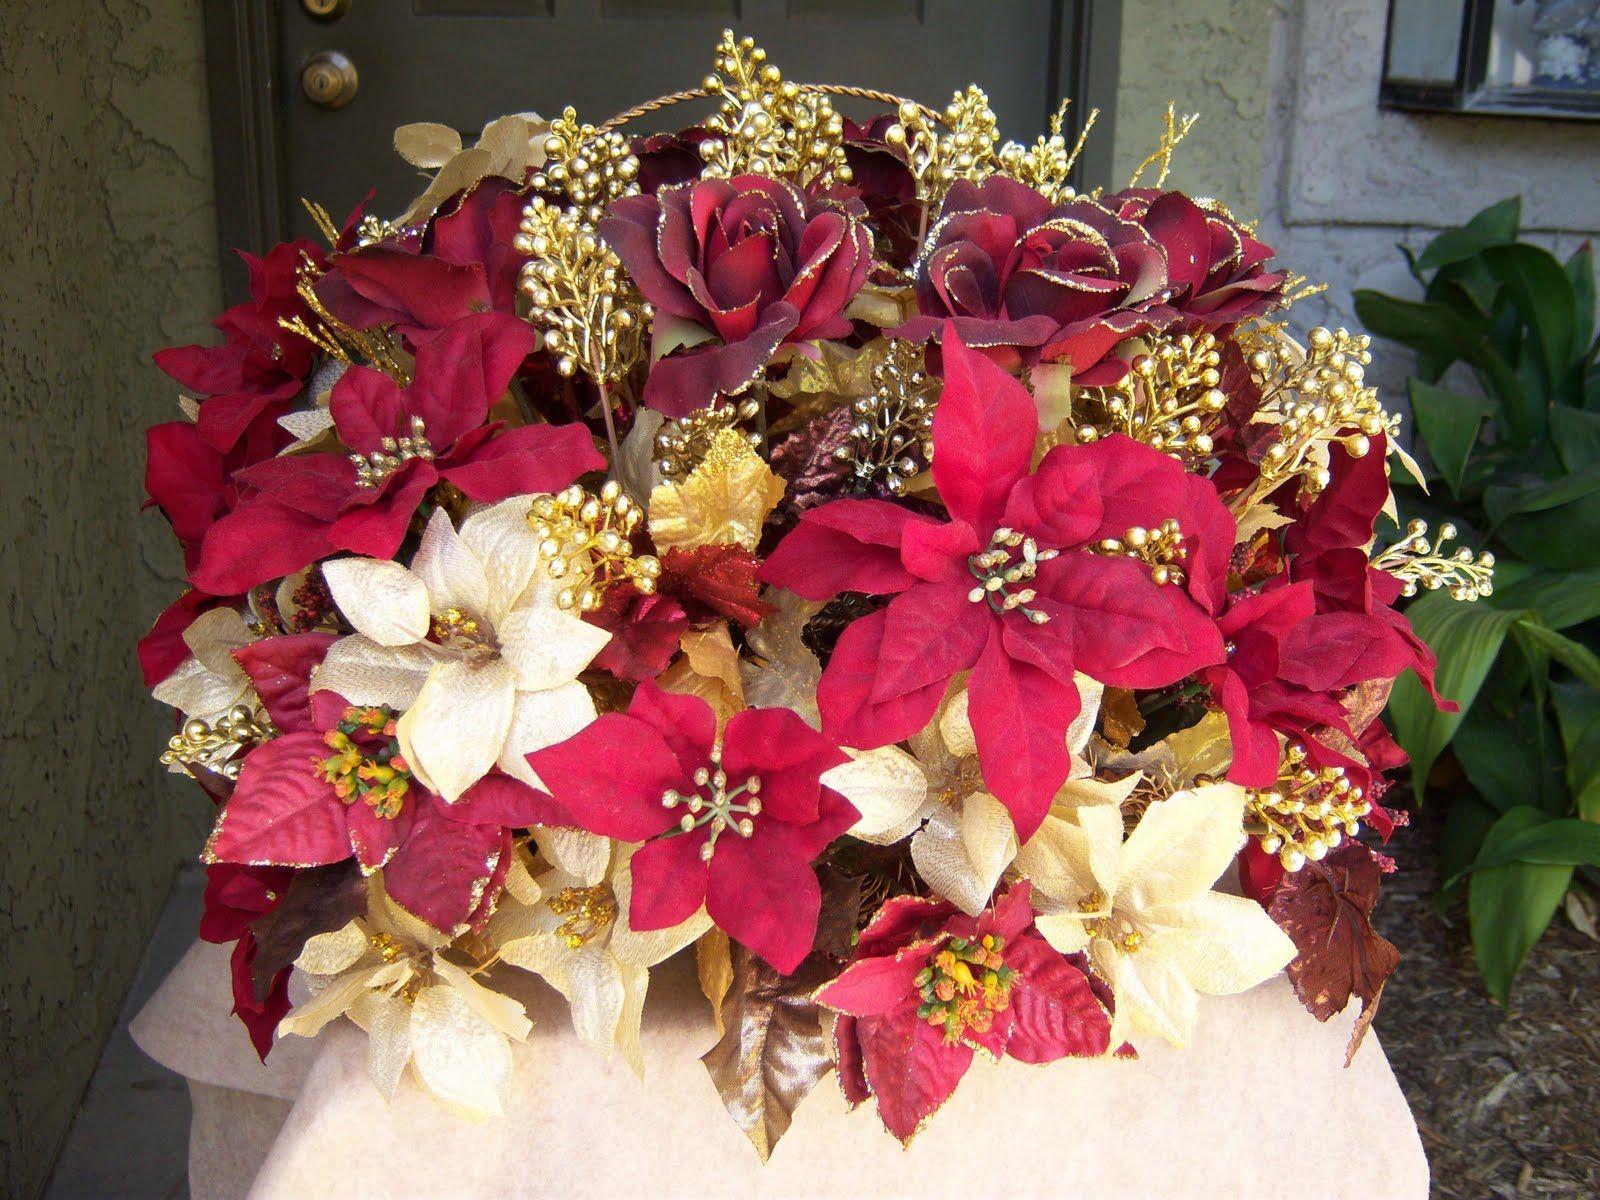 Pointsetta Centerpiece W Gold Flower Table Decorations Types Of Flower Arrangement White Flower Arrangements